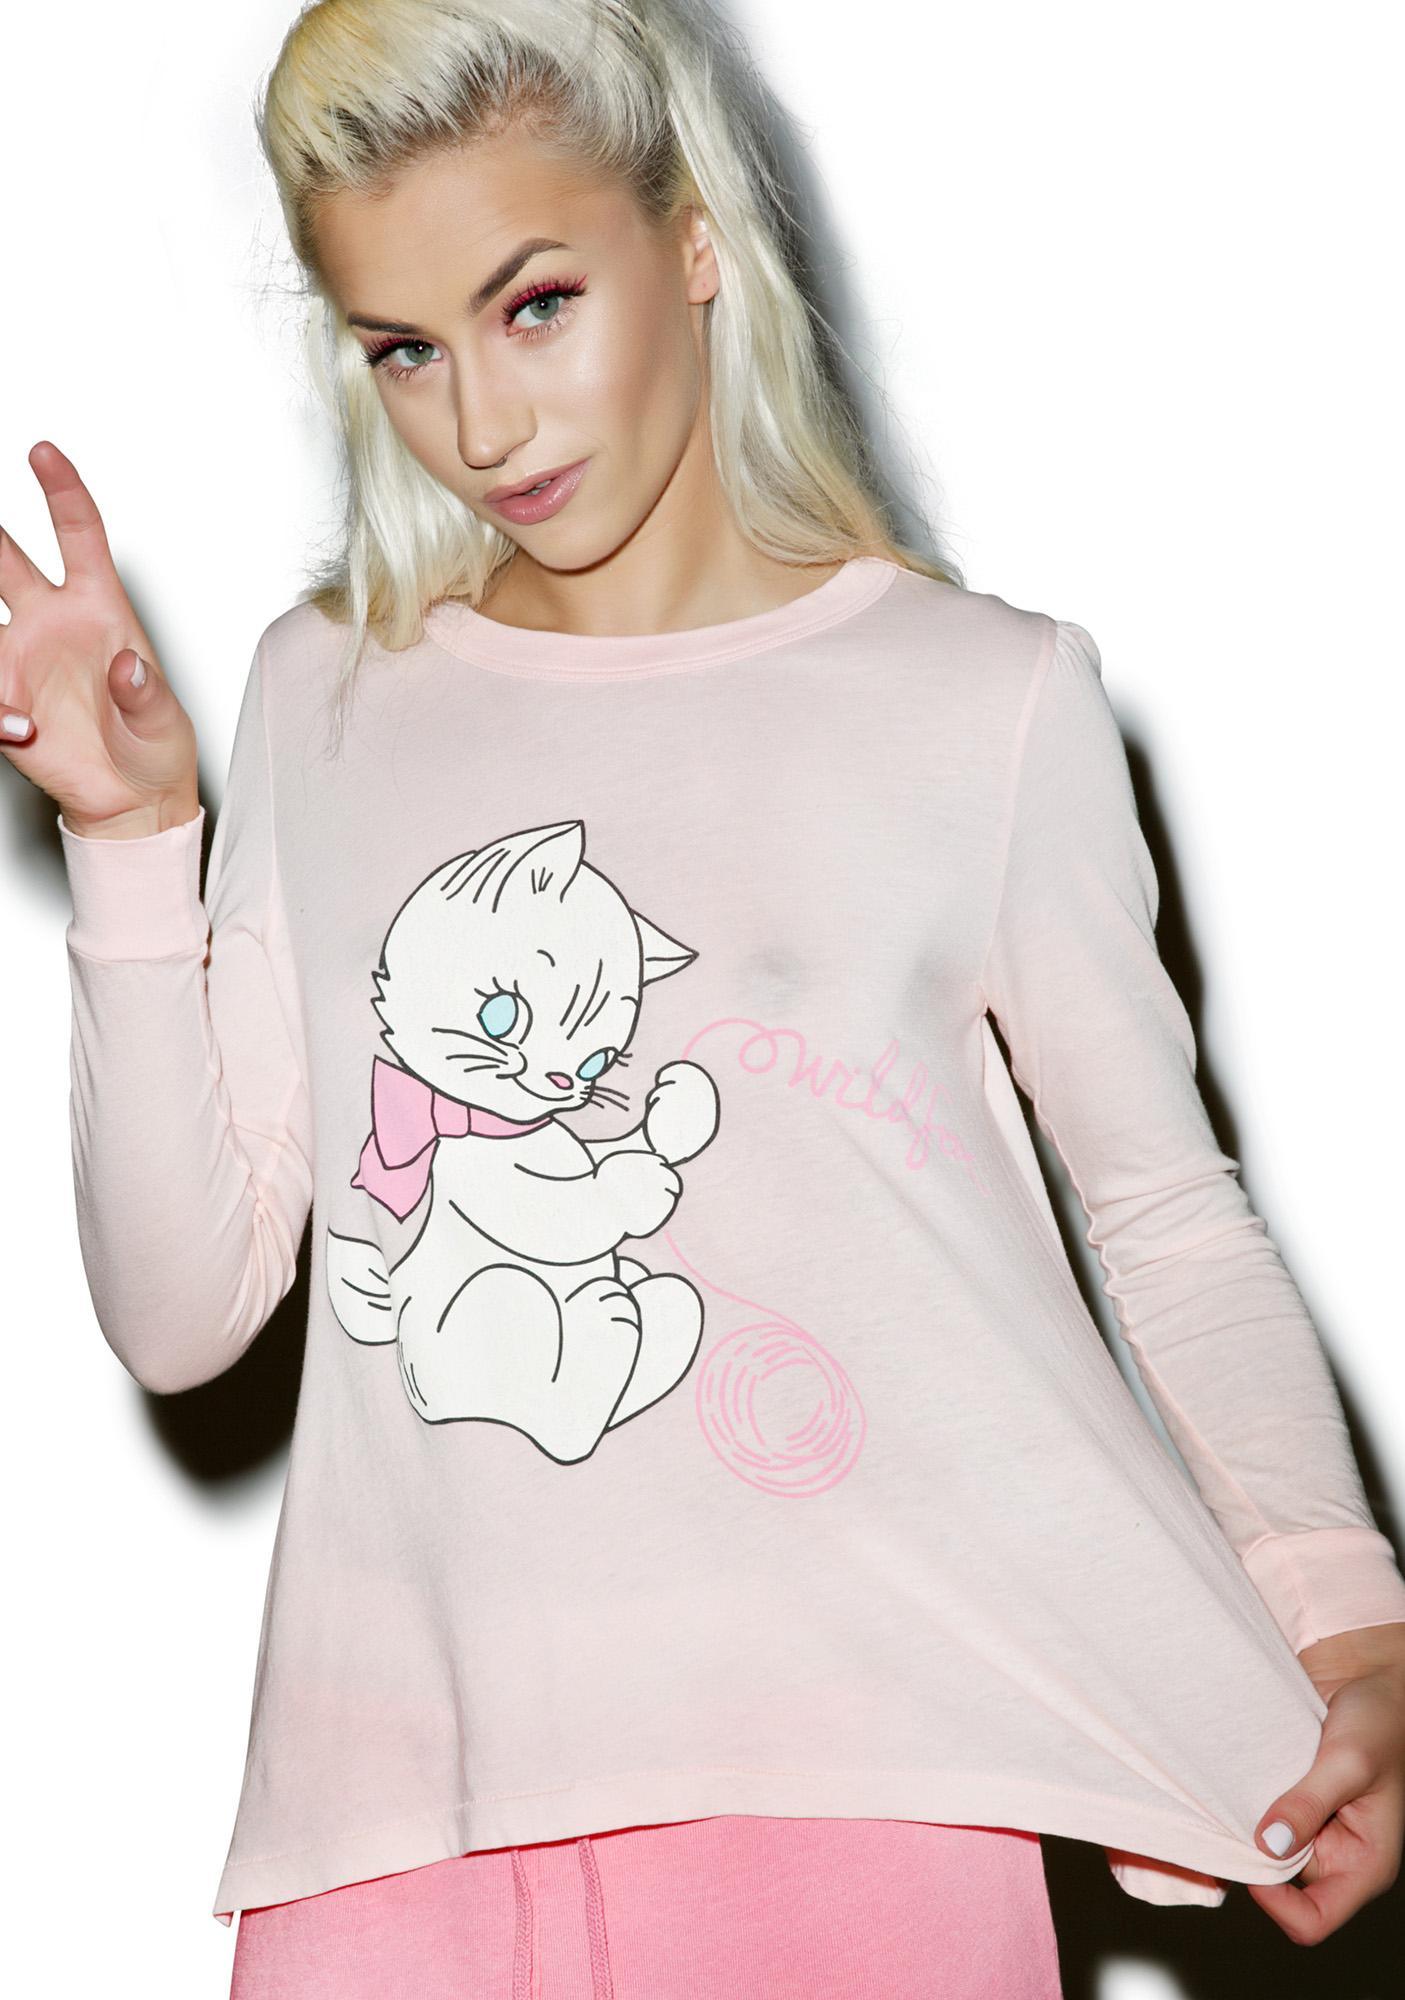 Wildfox Couture Playful Kitty Princess Tee